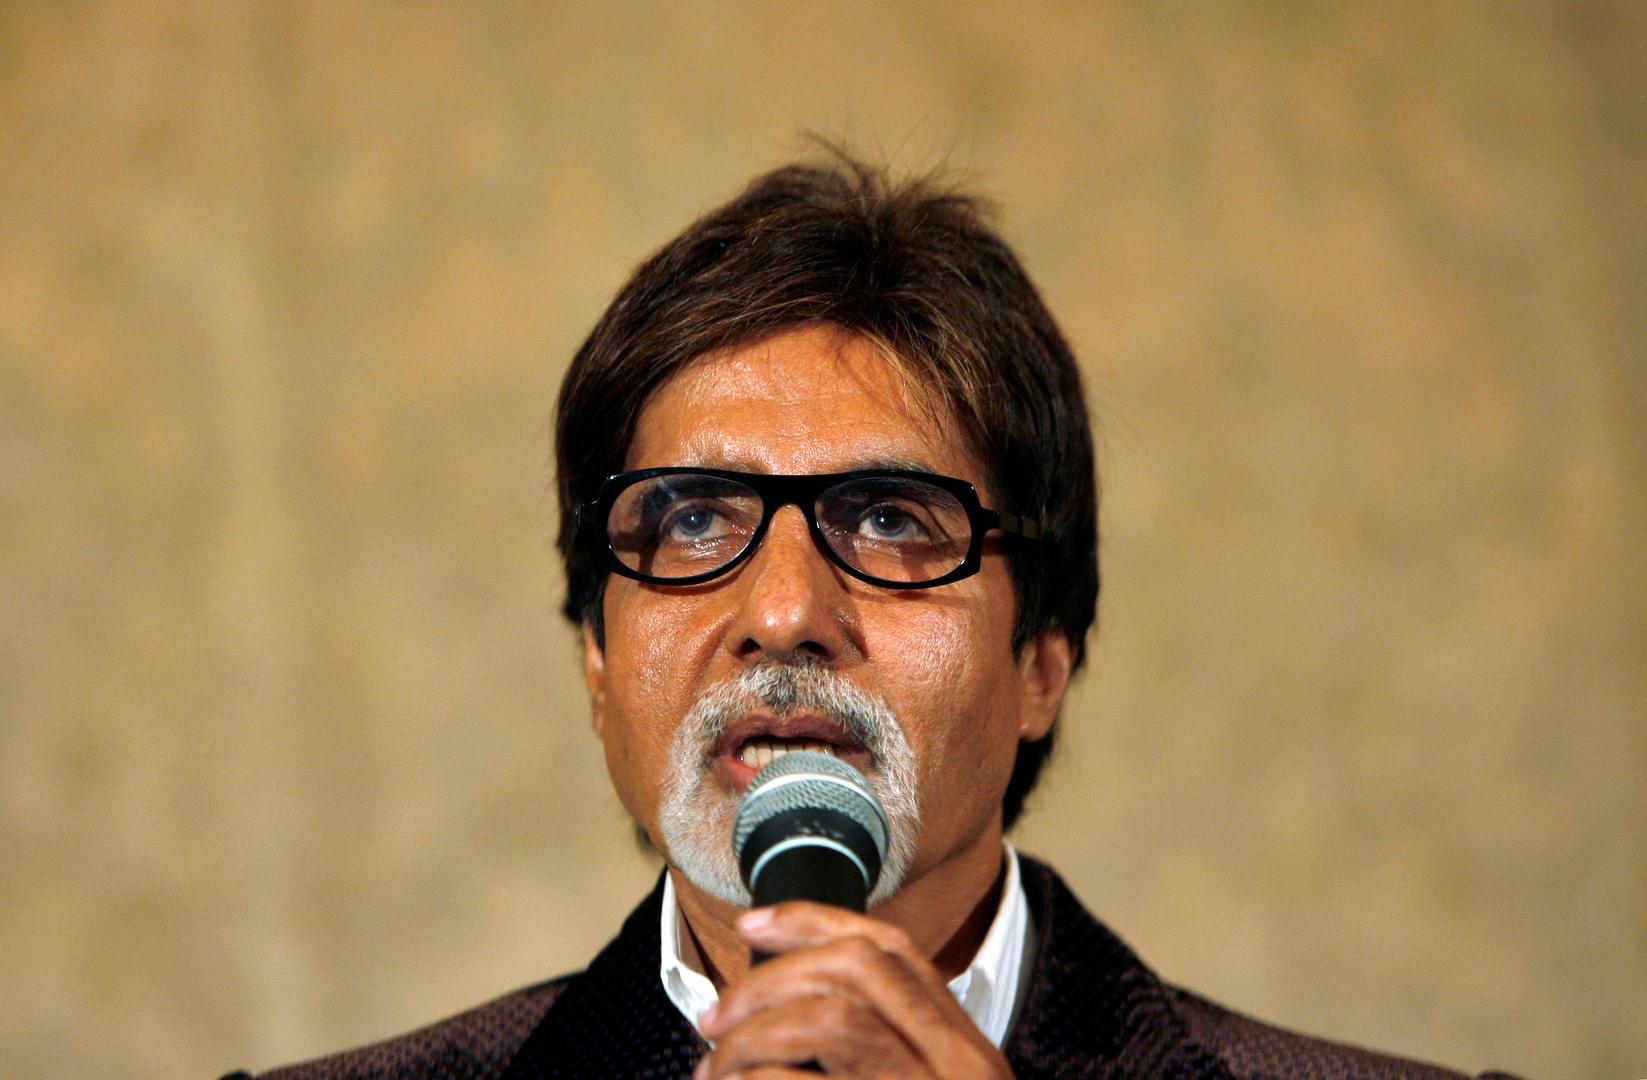 ممثل هندي مشهور يعلن إصابته بفيروس كورونا